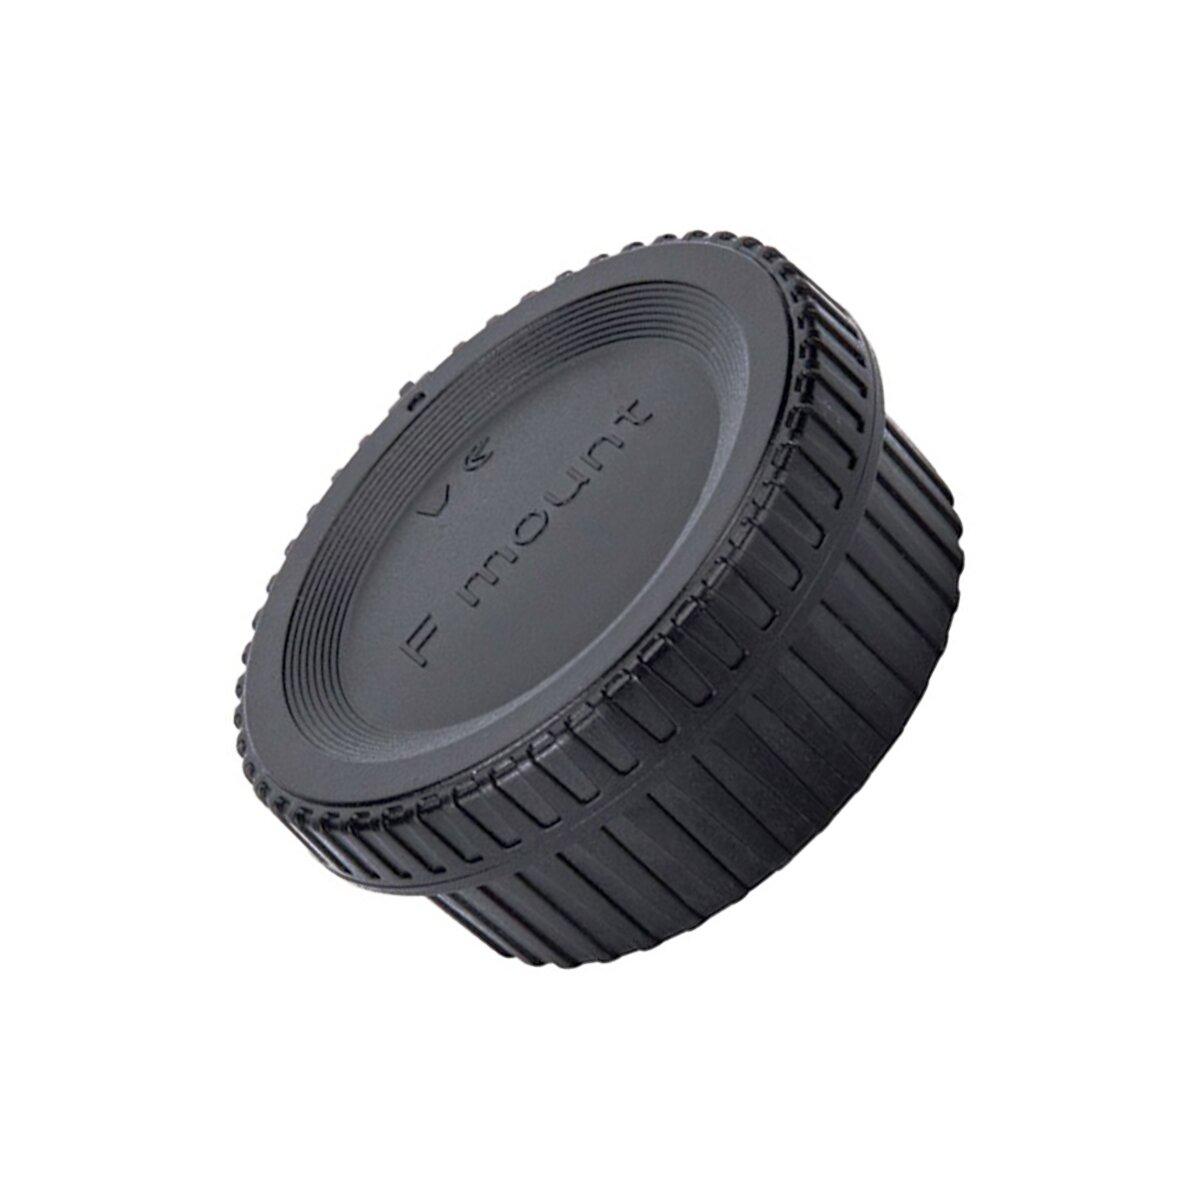 Gehäusedeckel und Objektivrückdeckel Camera Body Cap Set kompatibel mit Nikon F - L-R16